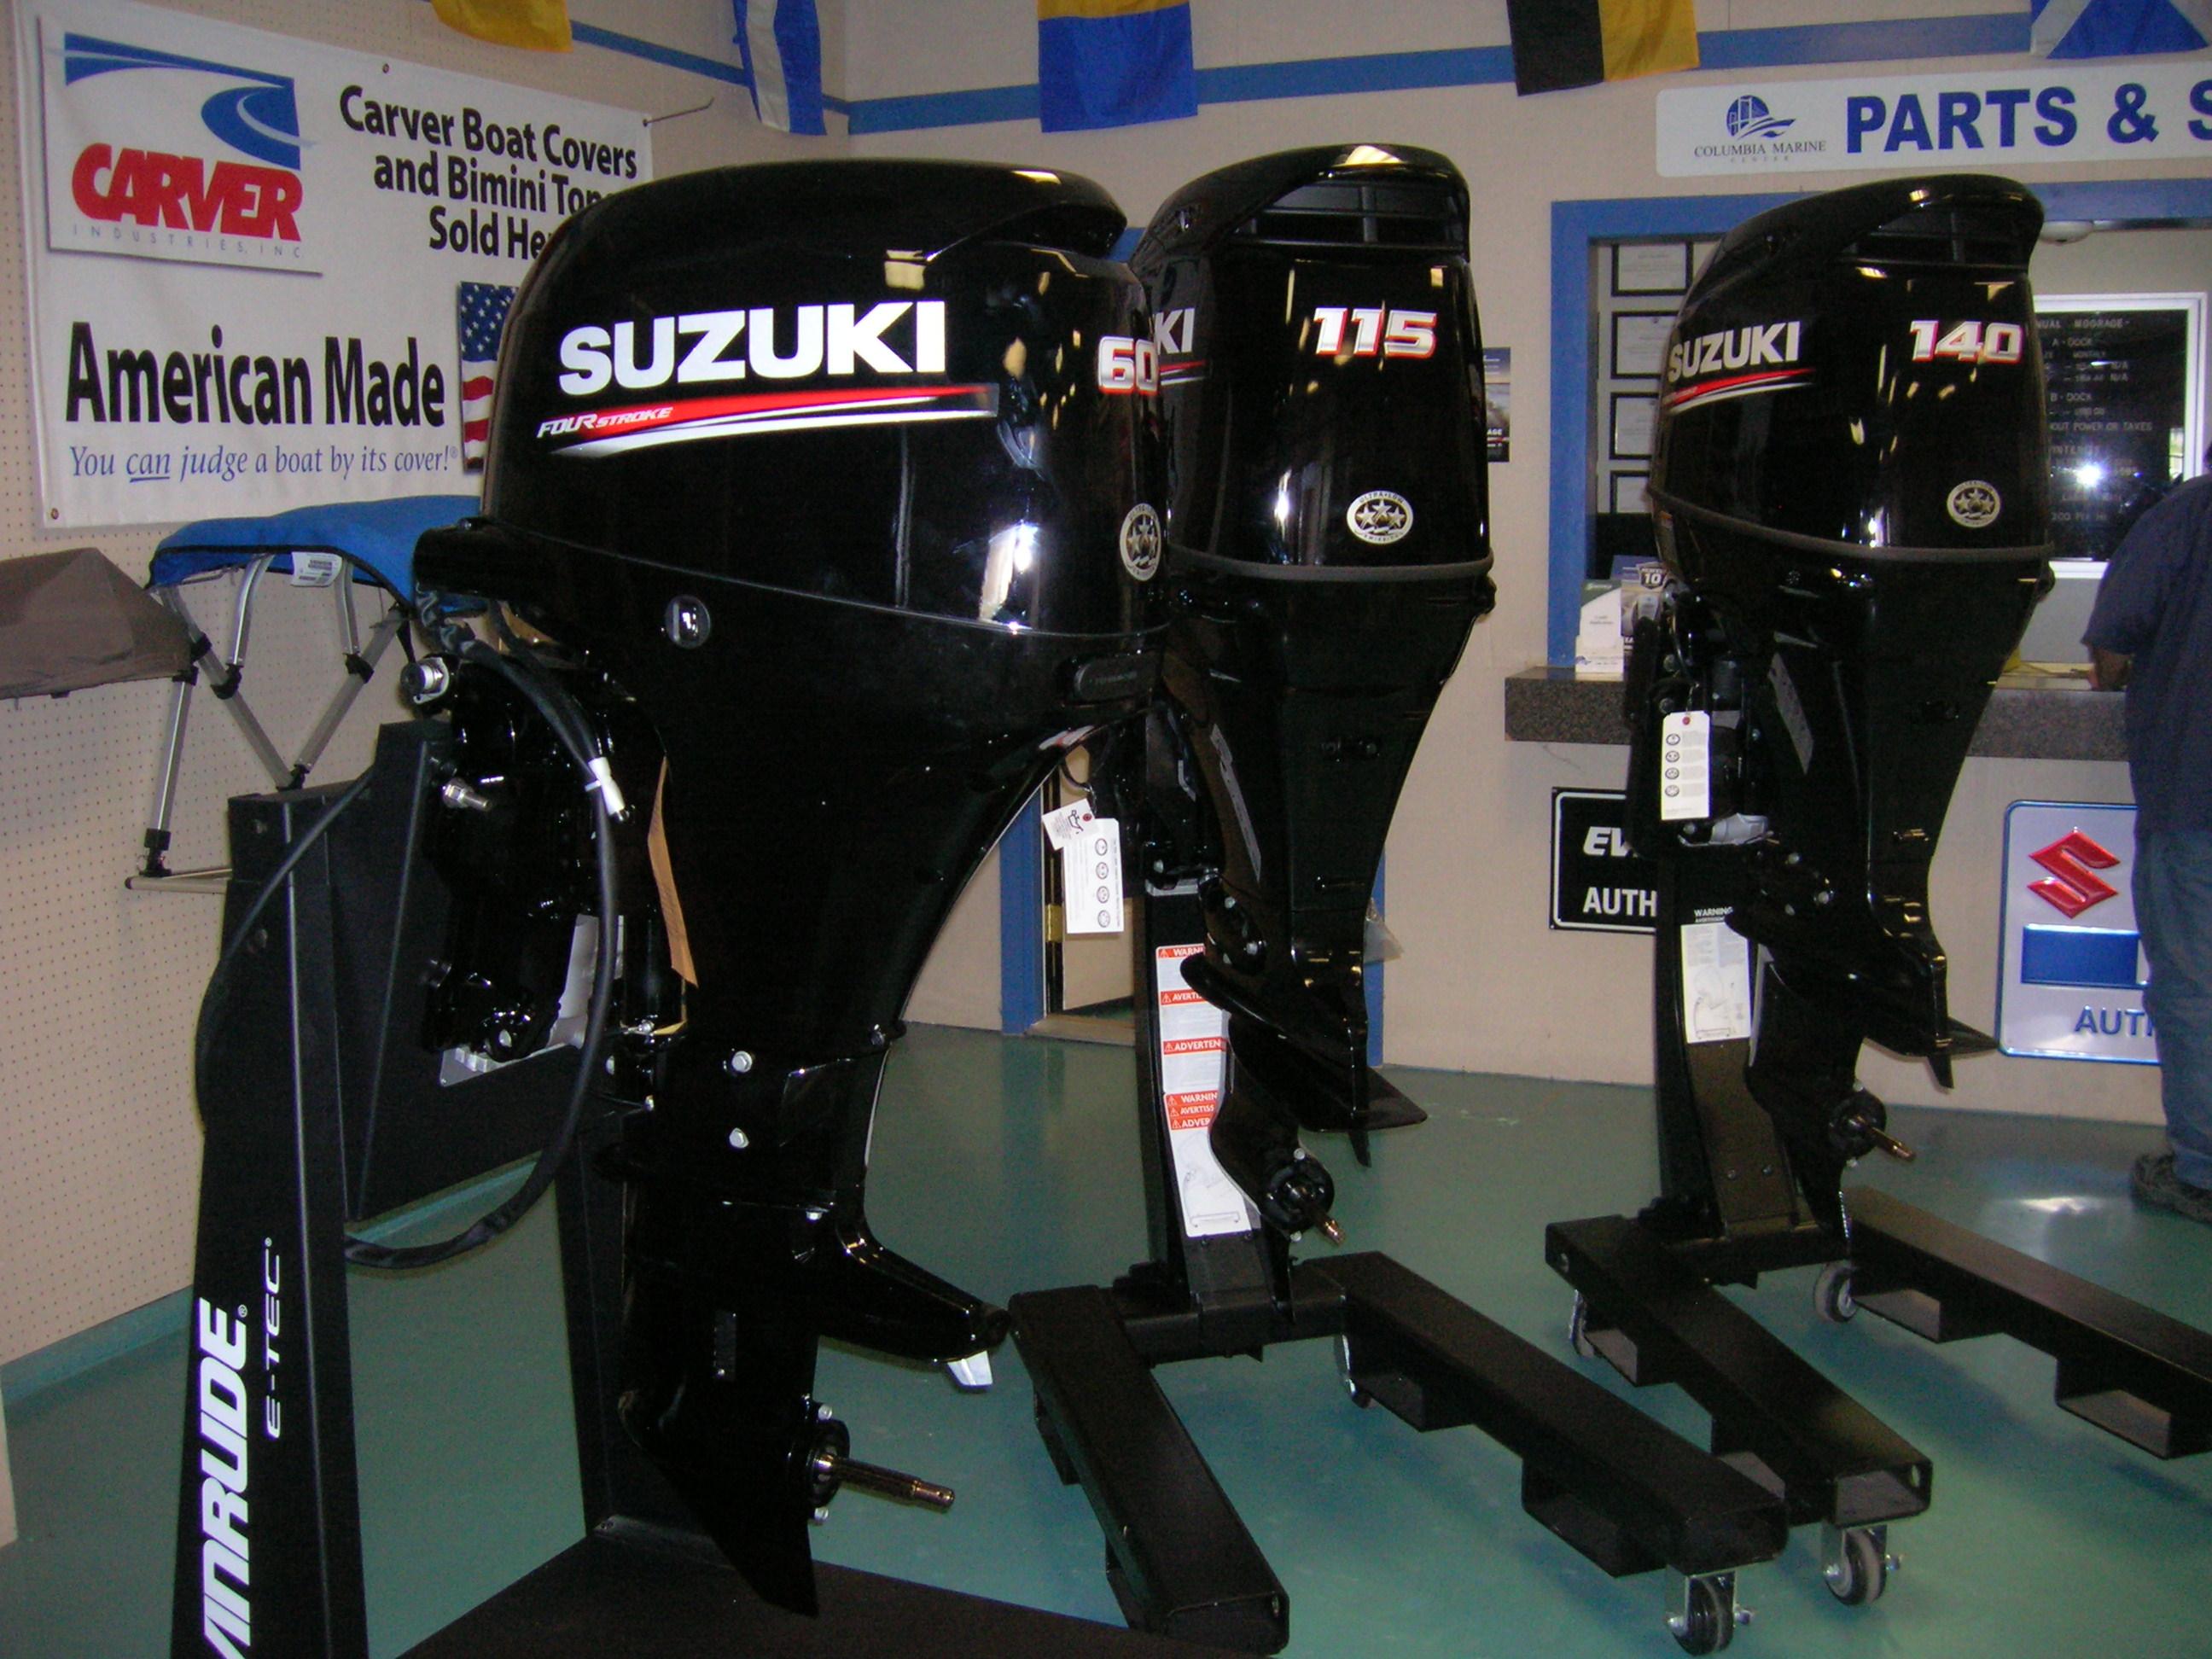 5 reasons to buy a Suzuki marine outboard motor